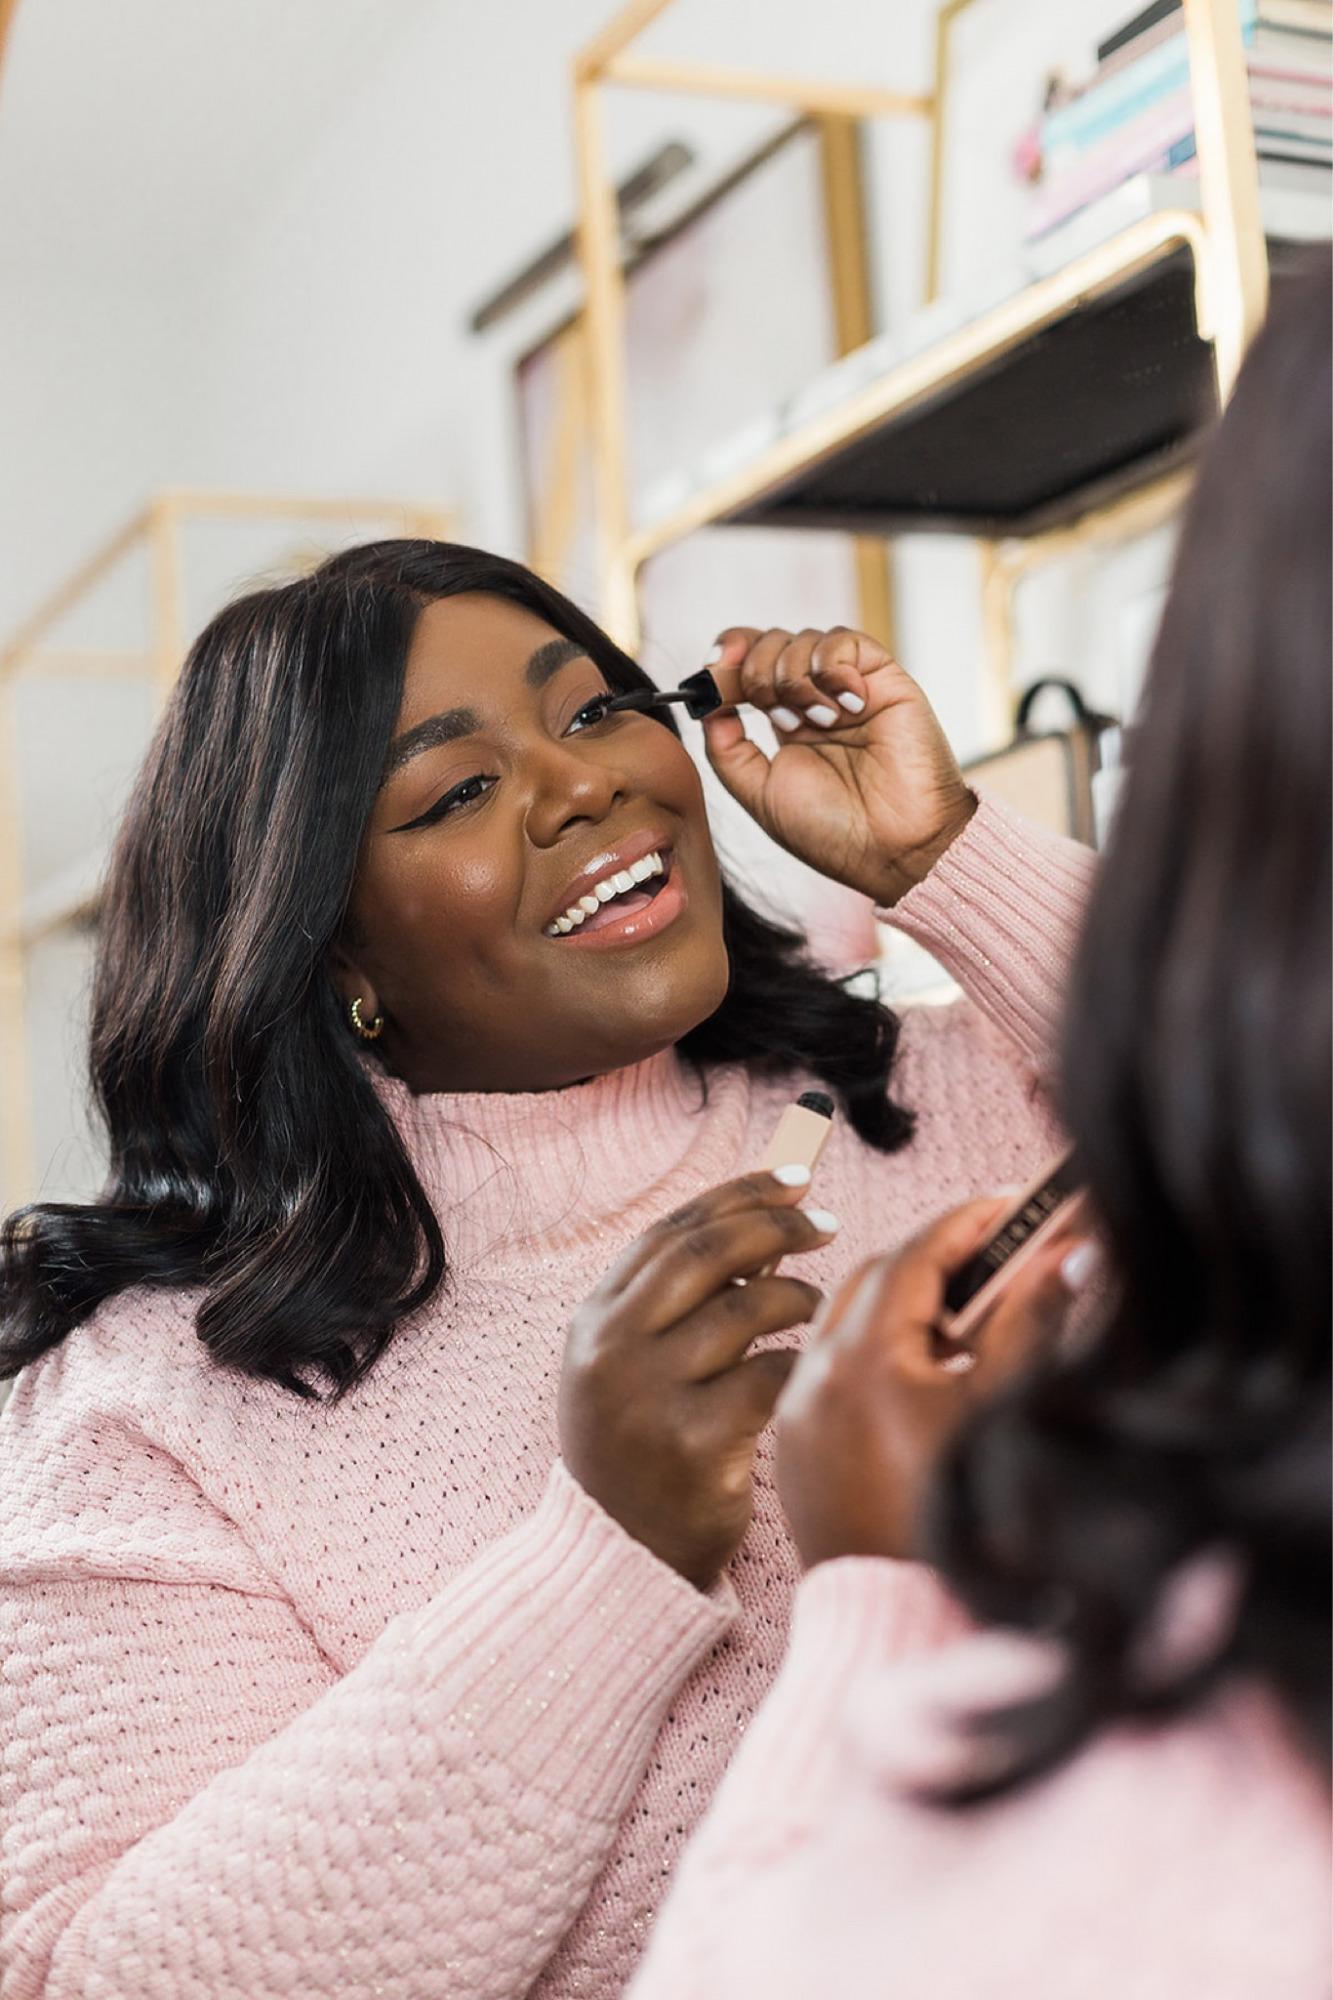 Black woman putting on makeup.  Black woman smiling putting on mascara.  Black Woman doing morning makeup routine.